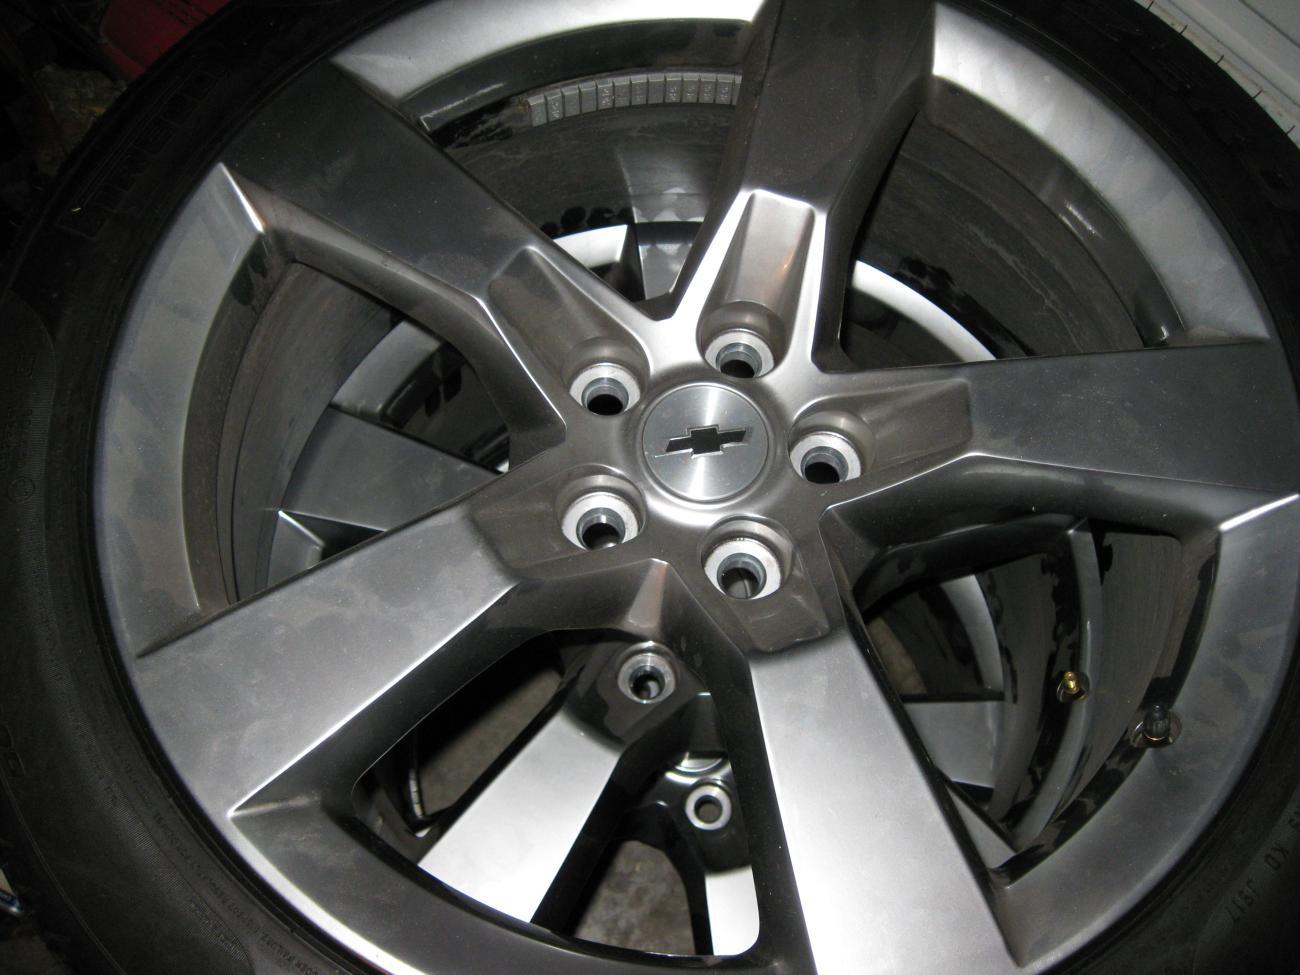 2011 rs tires and wheels camaro5 chevy camaro forum. Black Bedroom Furniture Sets. Home Design Ideas